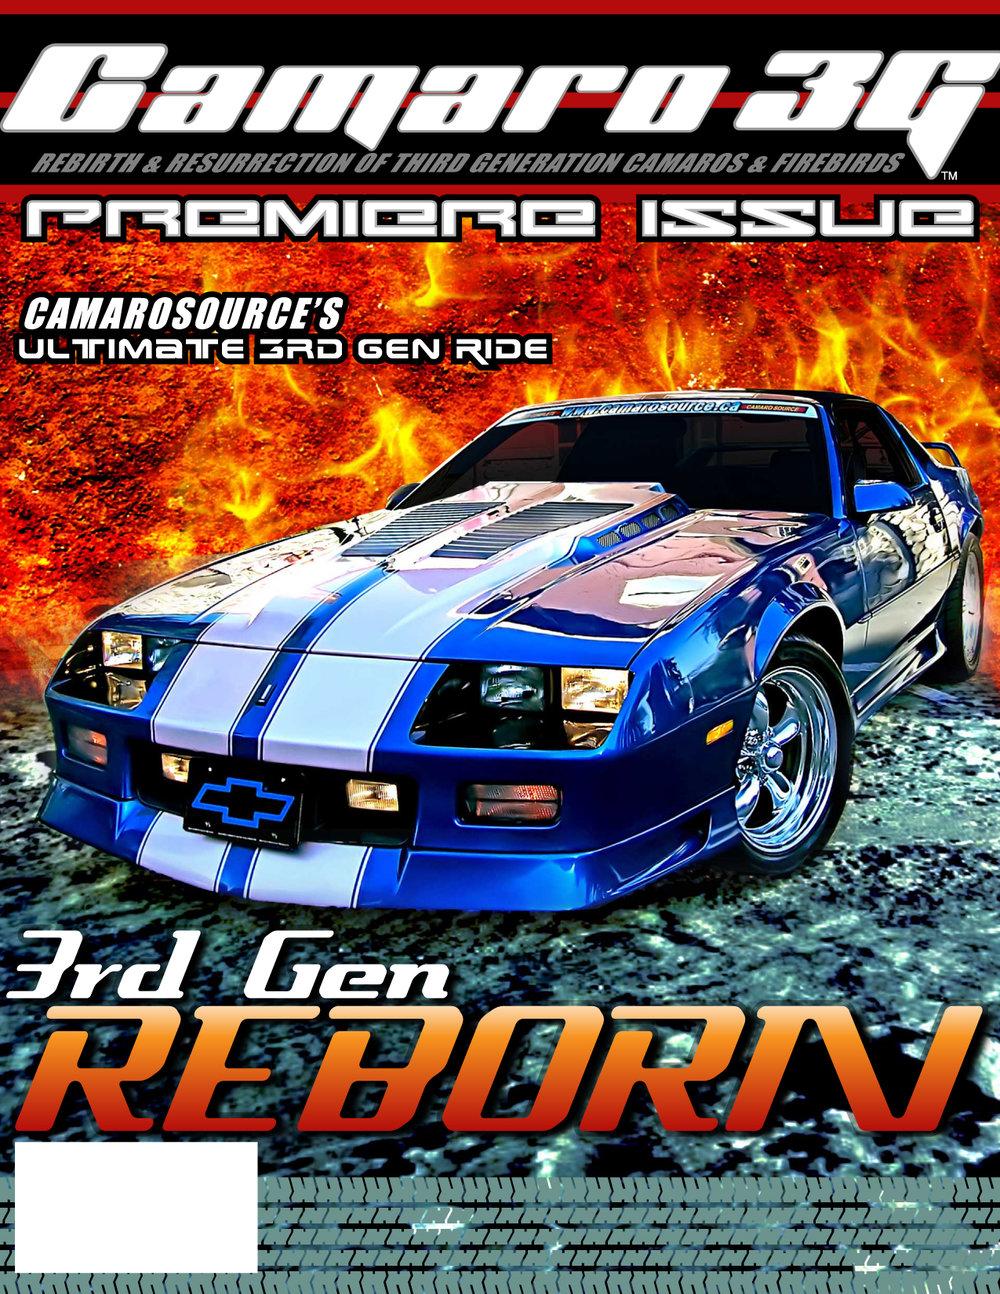 CAMARO MAG COVER-1T.jpg